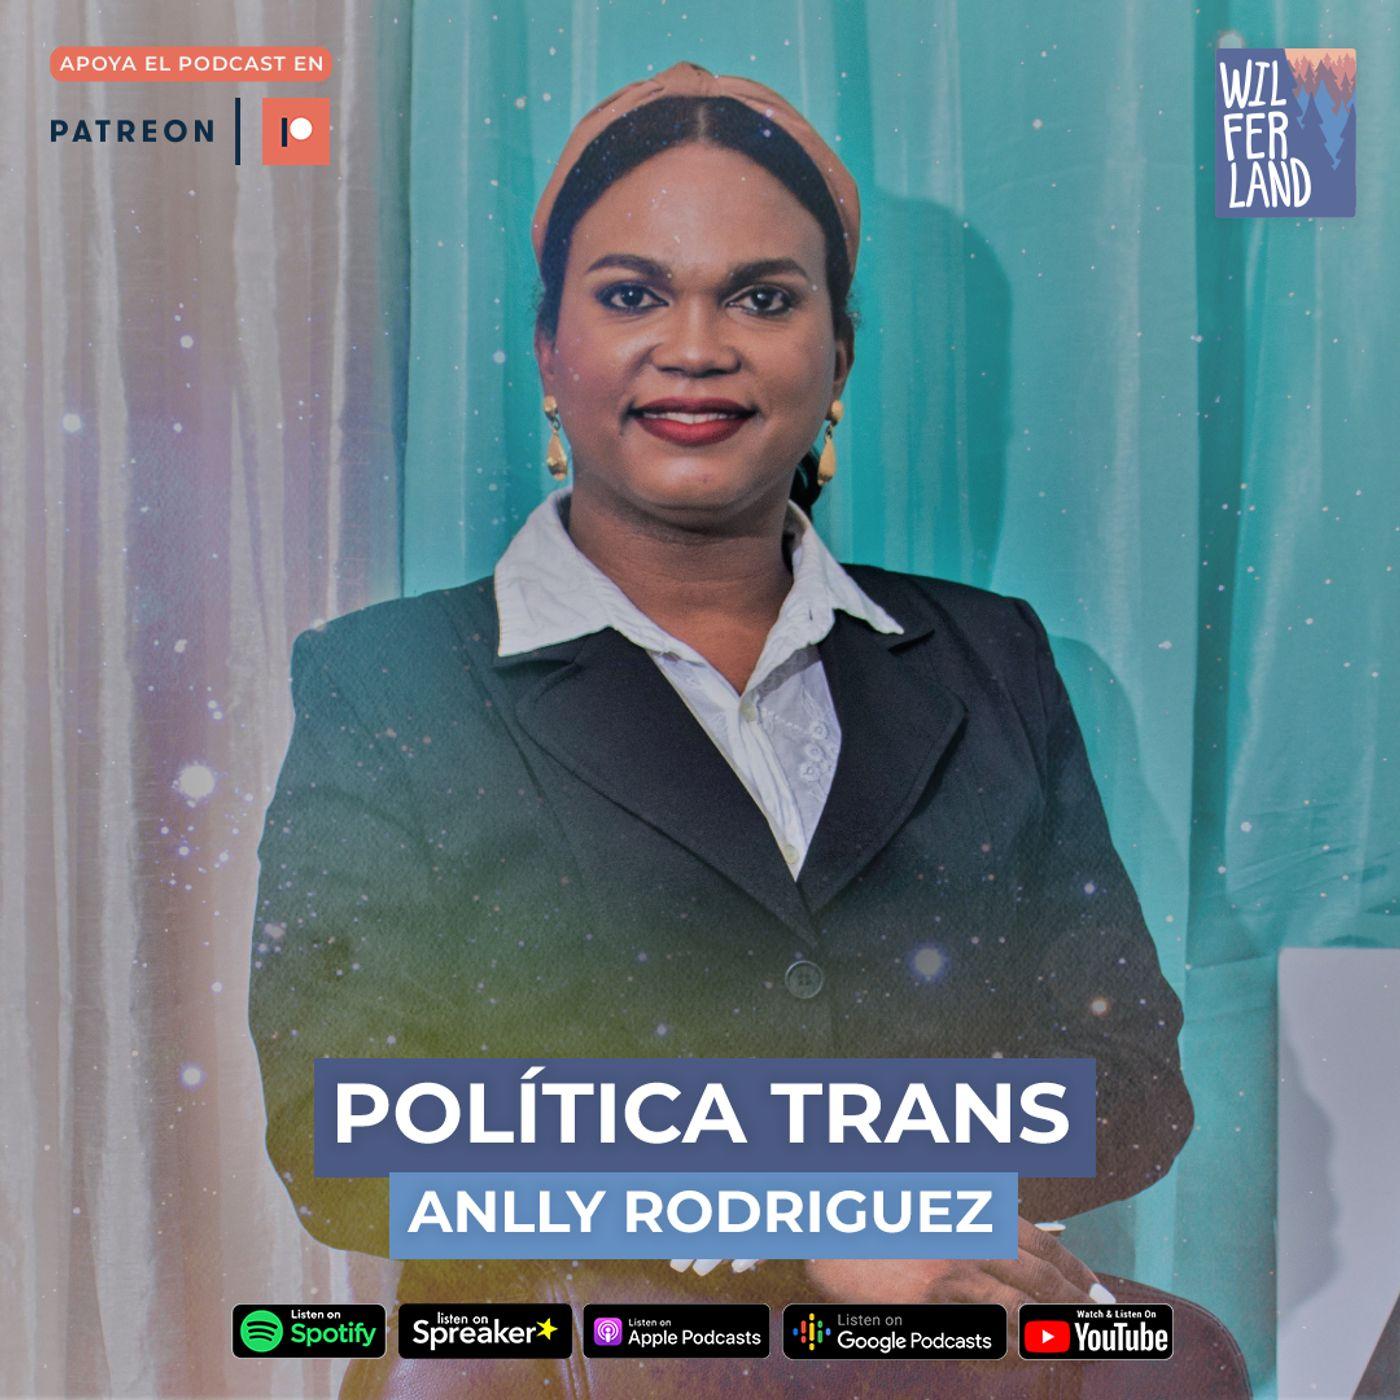 POLITICA TRANS